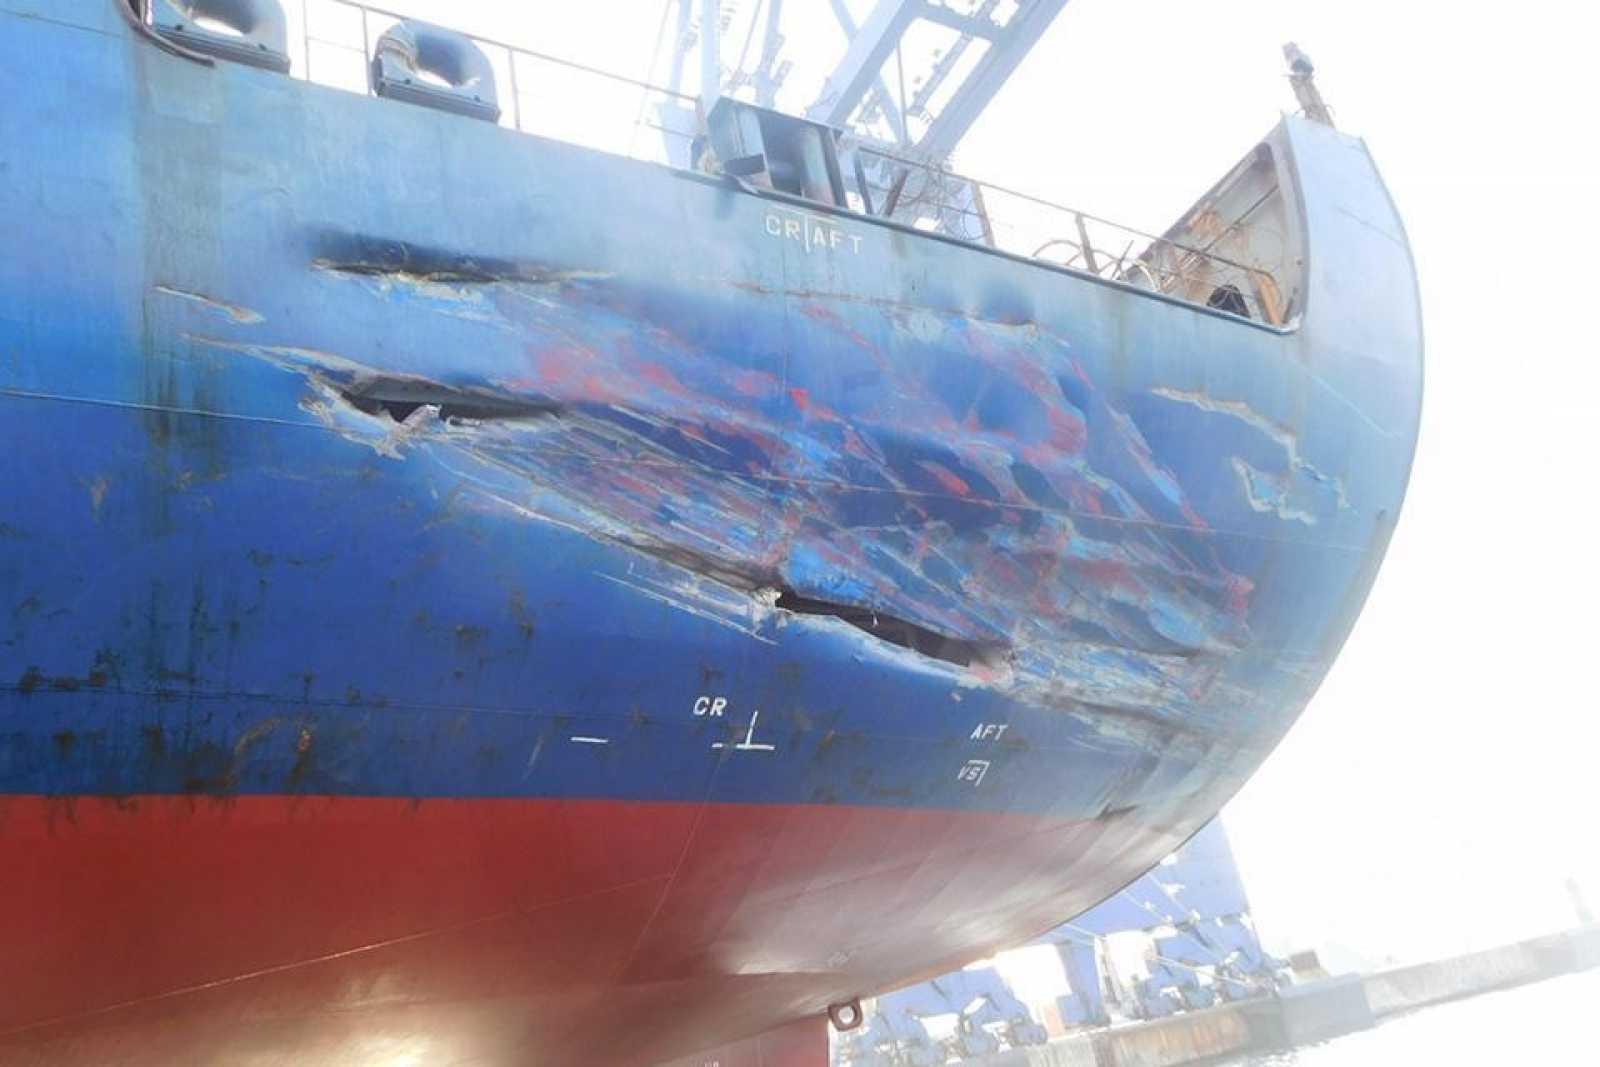 ANL Wyong port quarter damage MAIB pic